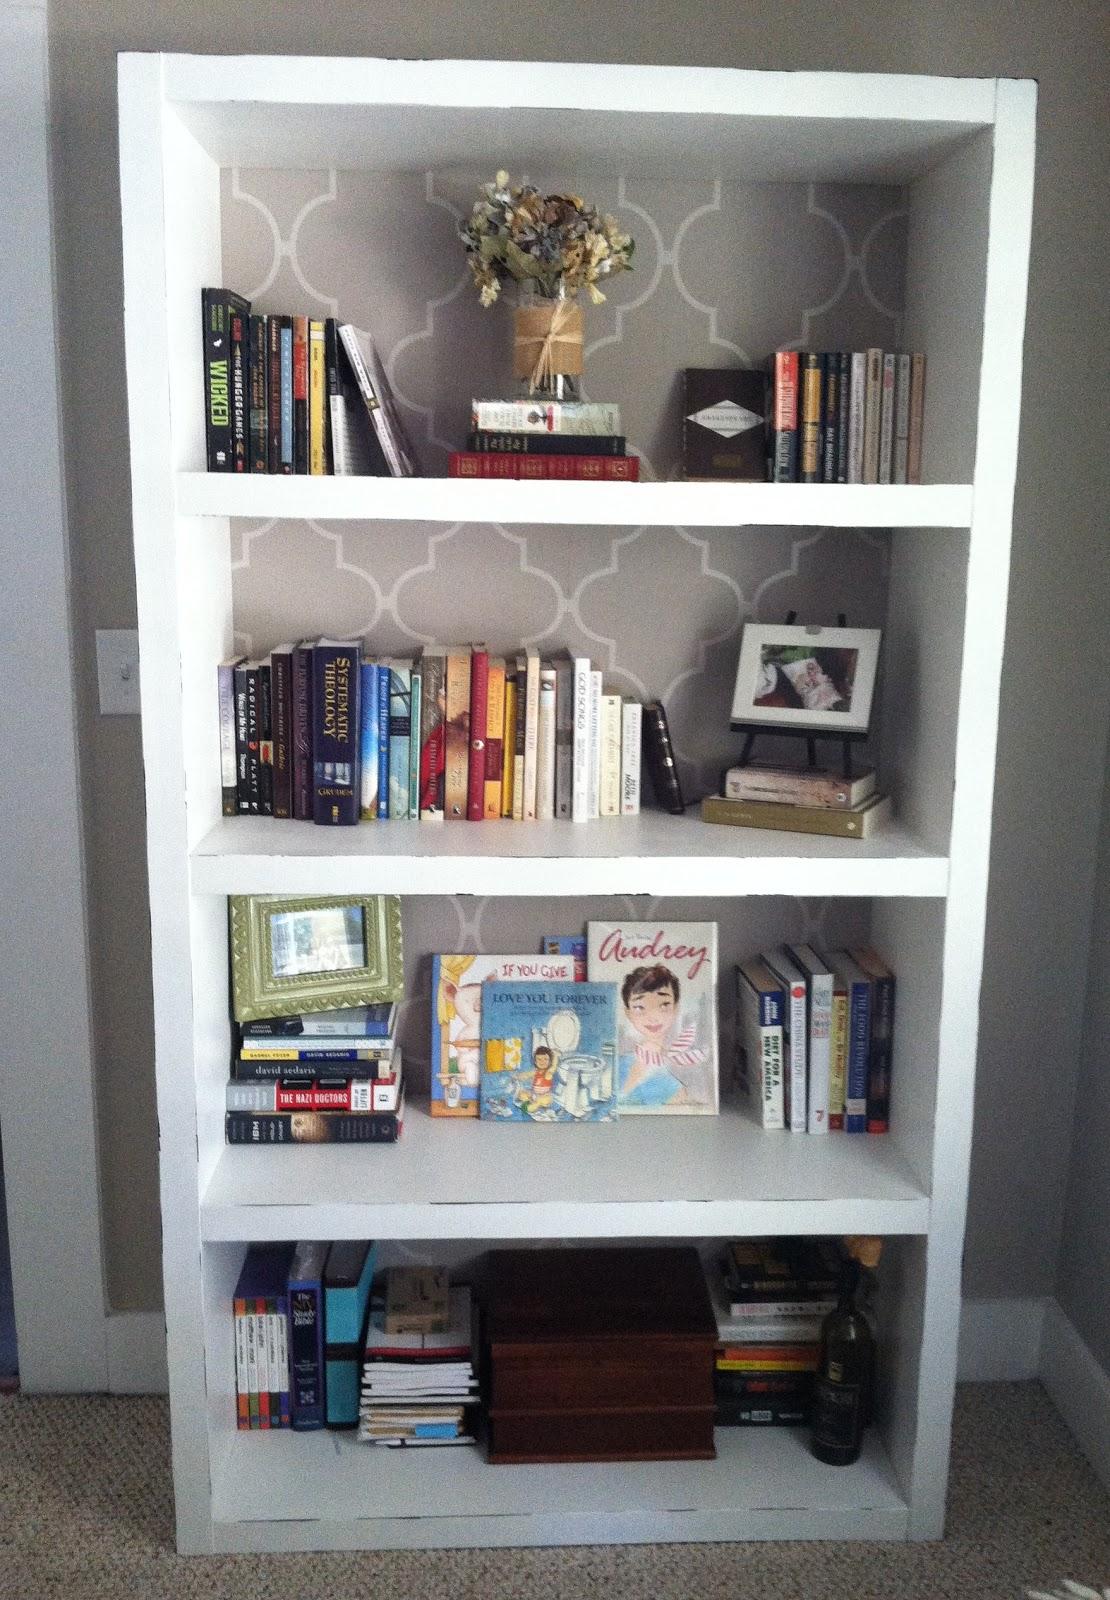 Use Your Words Little Girl Diy Bookshelf Makeover